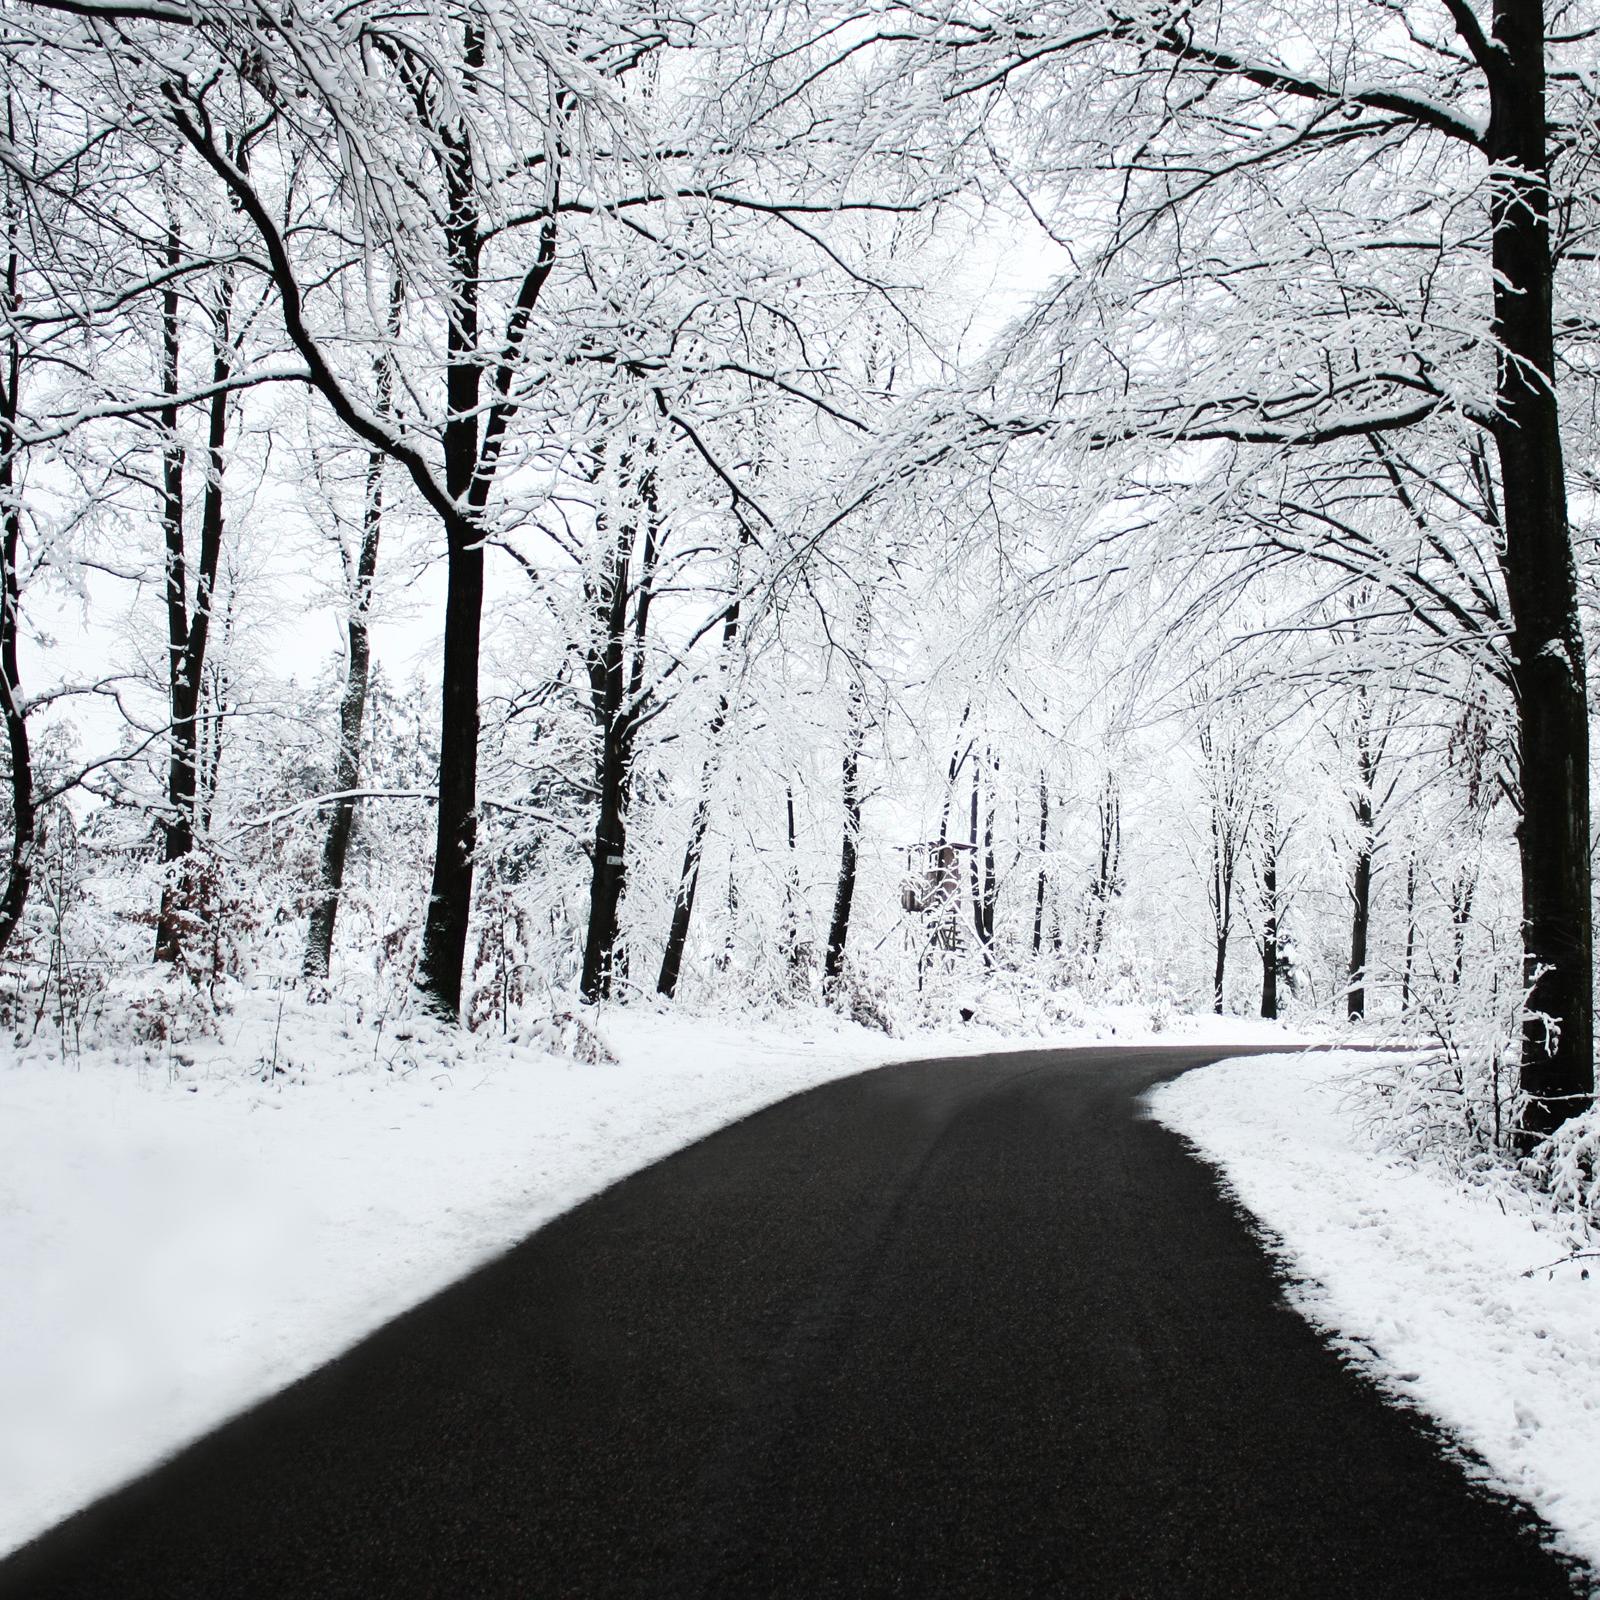 422-winter-snow-hd-pics.jpg